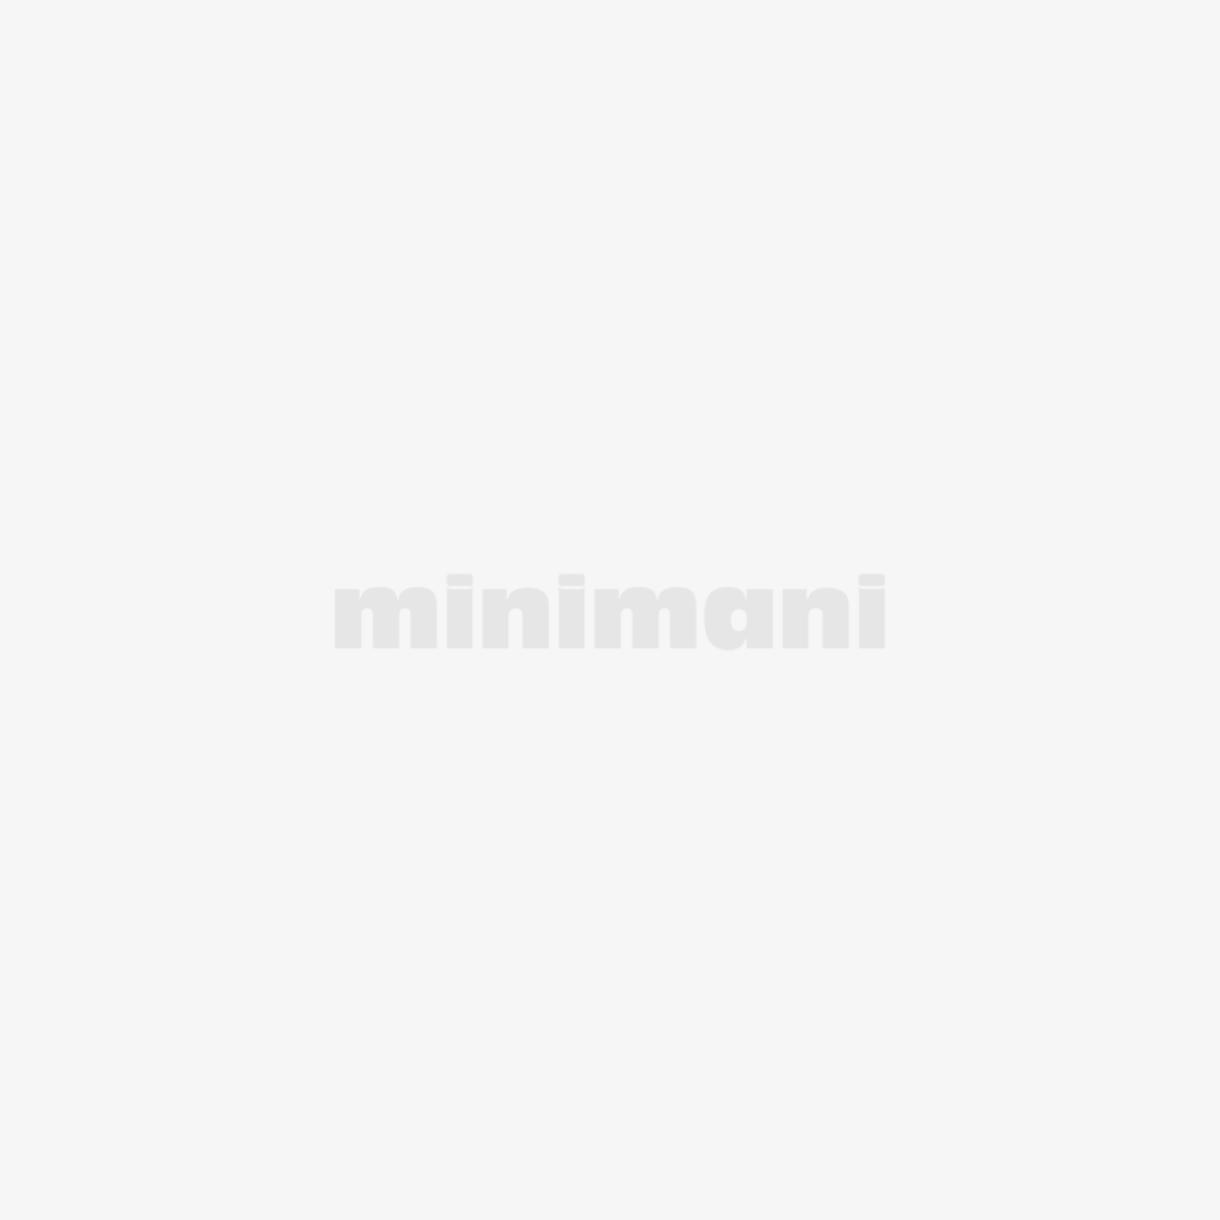 Vallila matto 140x200 cm, Madeleine Shiny sininen